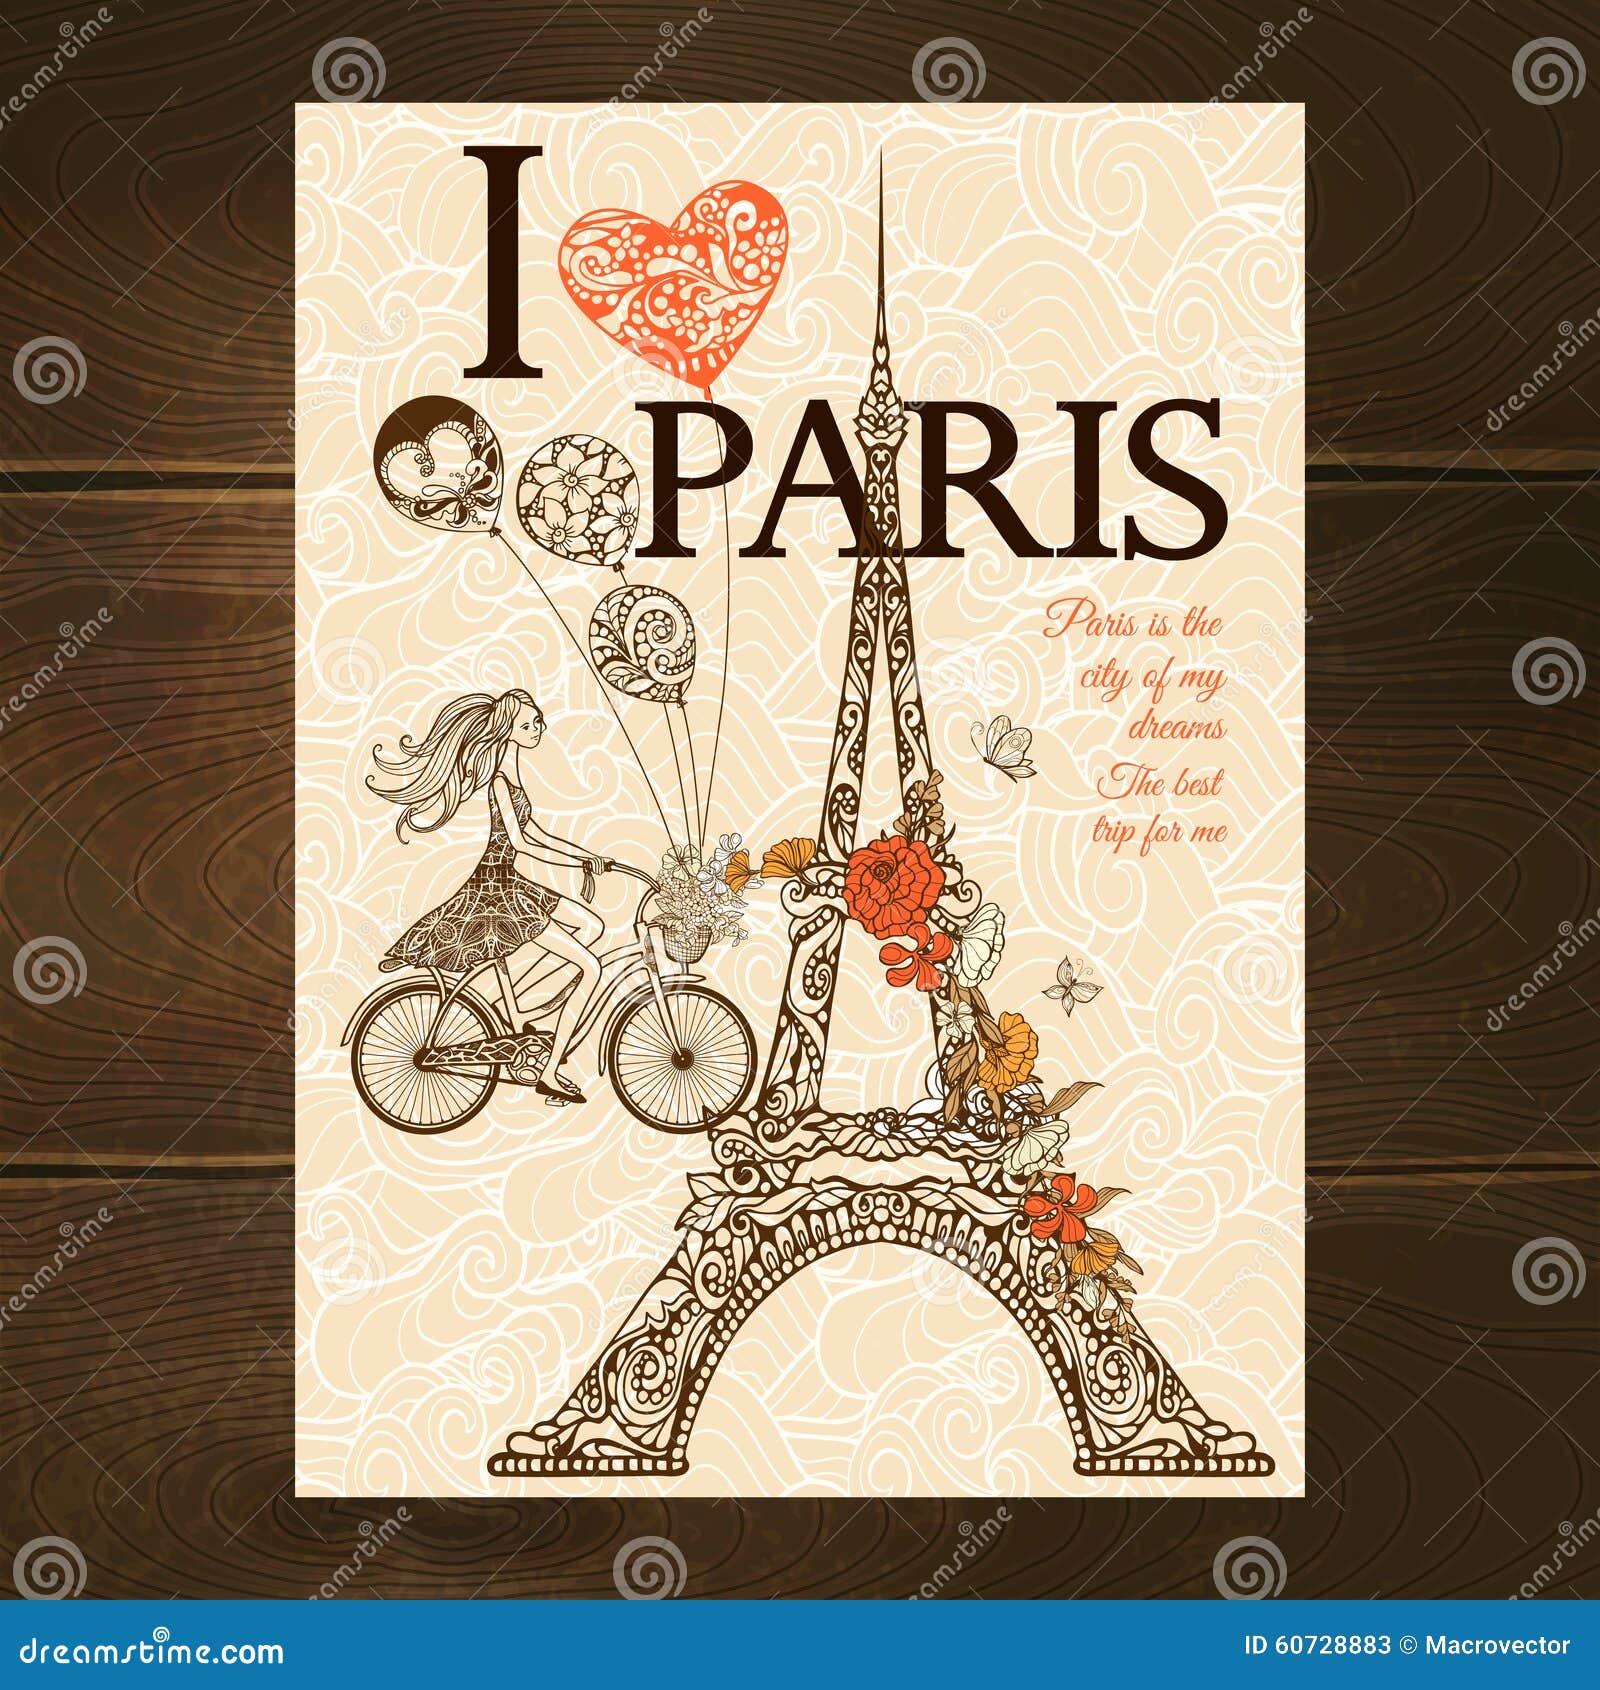 Vintage Paris Poster Stock Vector Image 60728883